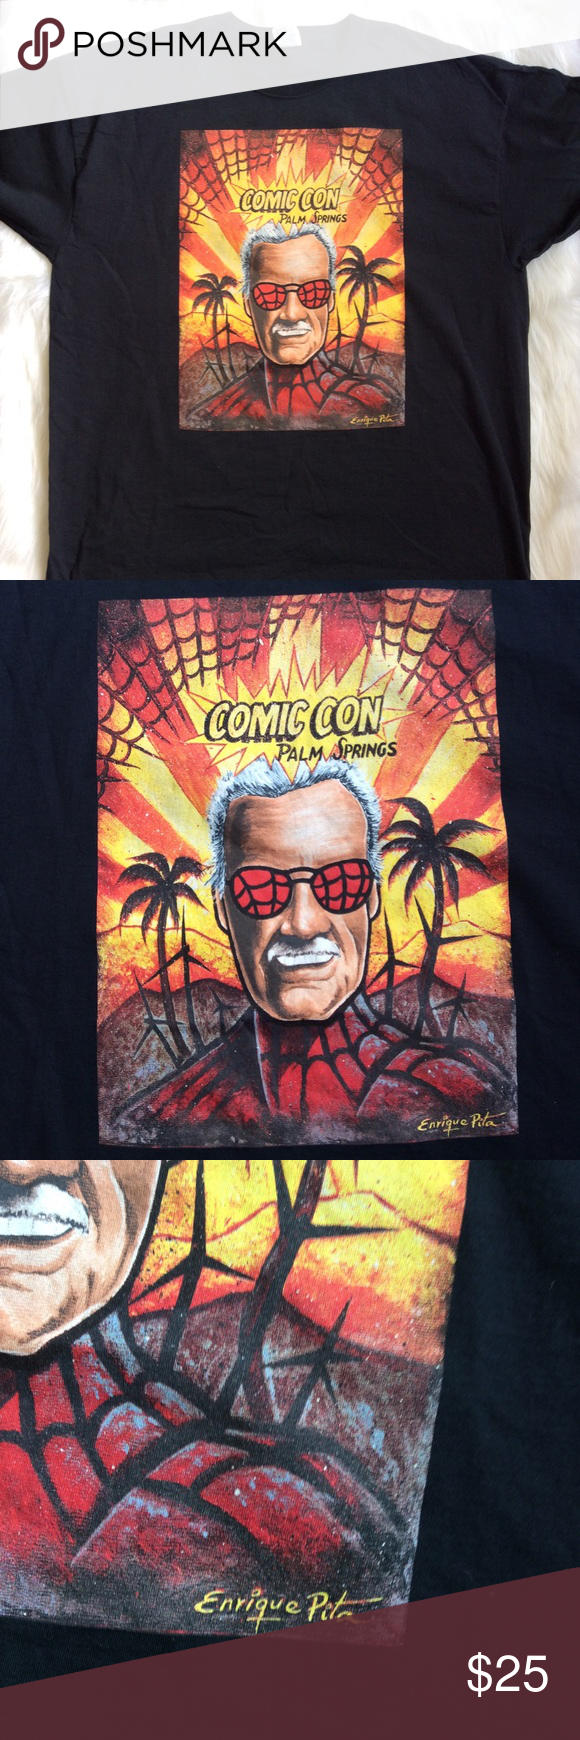 Comic Con Palm Springs Spider Man Stan Lee Tshirt Clothes Design Tshirt Art Fashion Design